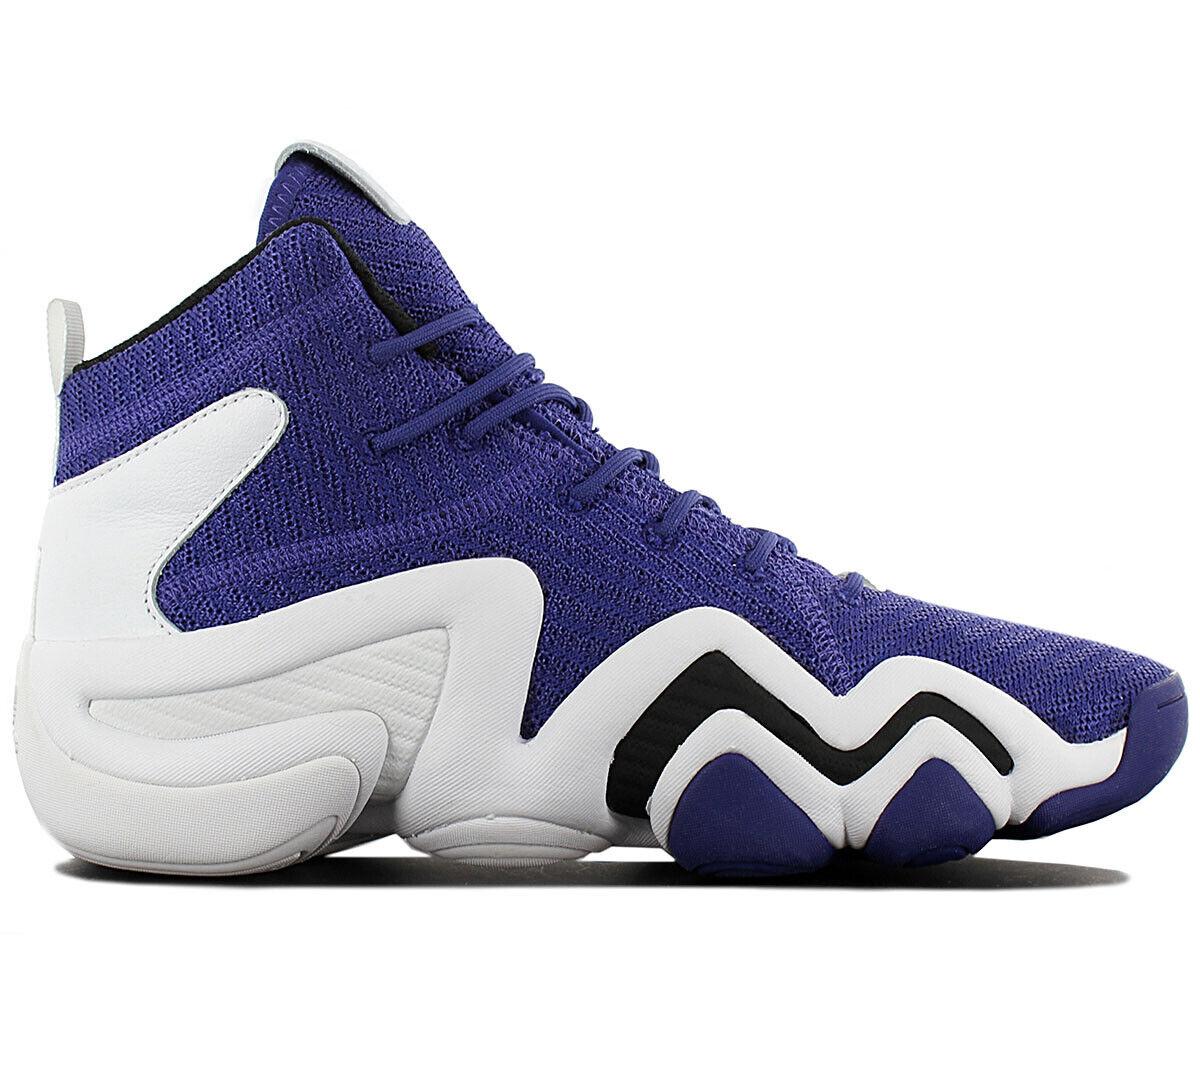 Adidas Crazy 8 Adv Pk  Primeknit Basketball scarpe CQ0988 blu scarpe Trainers  negozio online